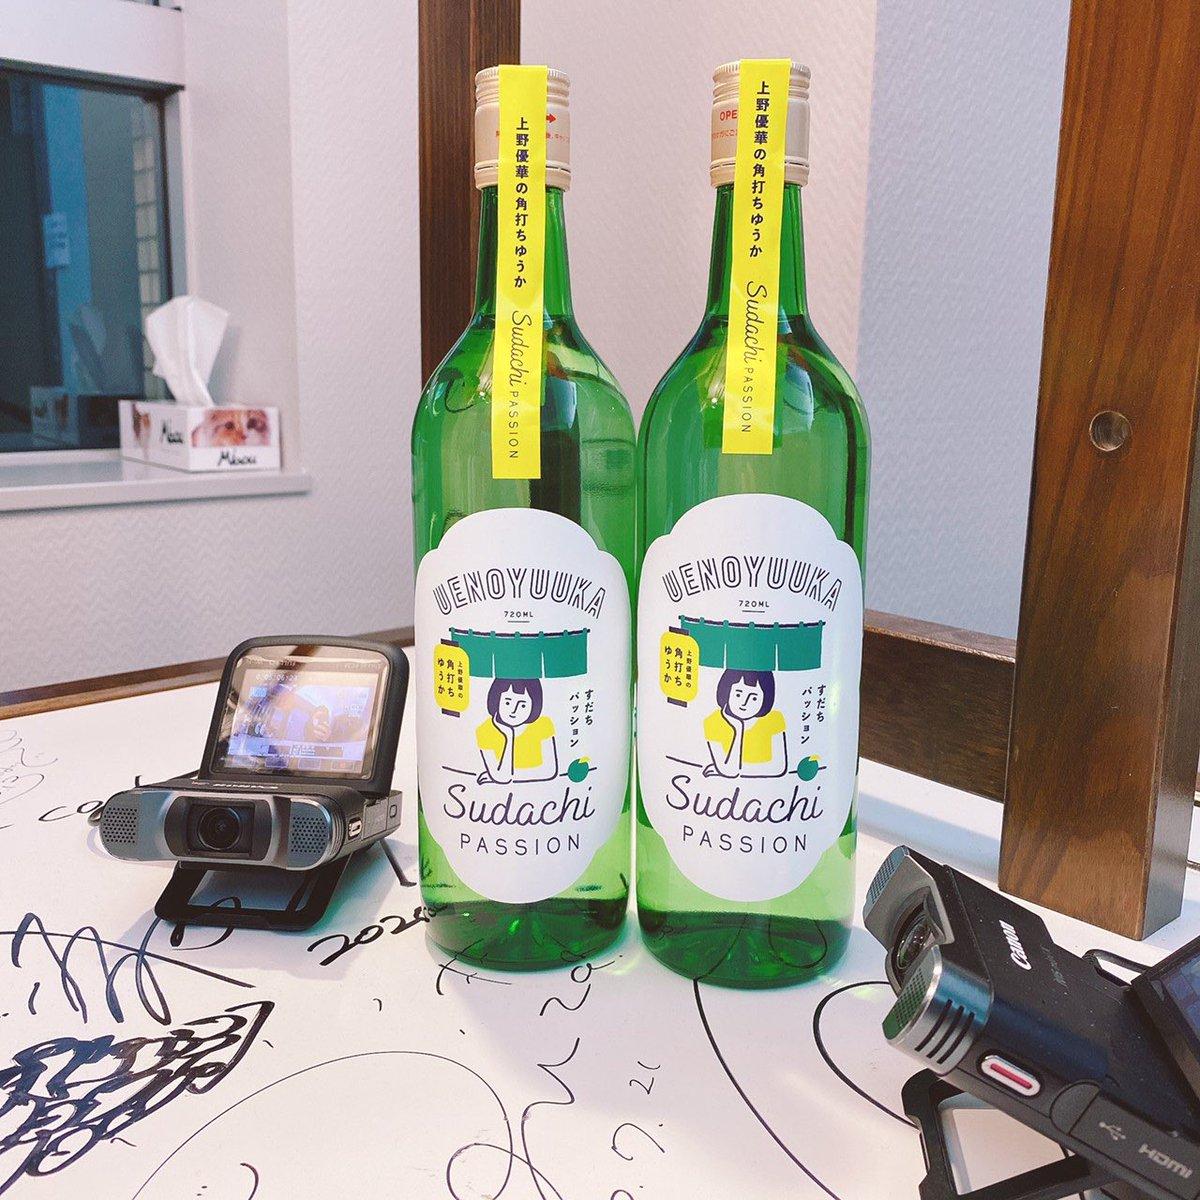 test ツイッターメディア - お酒好きが高じて、遂にオリジナル酒を作ってしまった🙌  #KURAND さんと #tvk「上野優華の #角打ちゆうか」のコラボ! 地元徳島の名産〝すだち〟の甘くて爽やかなお酒「すだちパッション」✨ 期間限定、数量限定なのでお早めに🌈 オリジナルコースターもつくよ! 売れろ〜👼 https://t.co/rGZfYqSYr9 https://t.co/Ssrhg2t6Eu